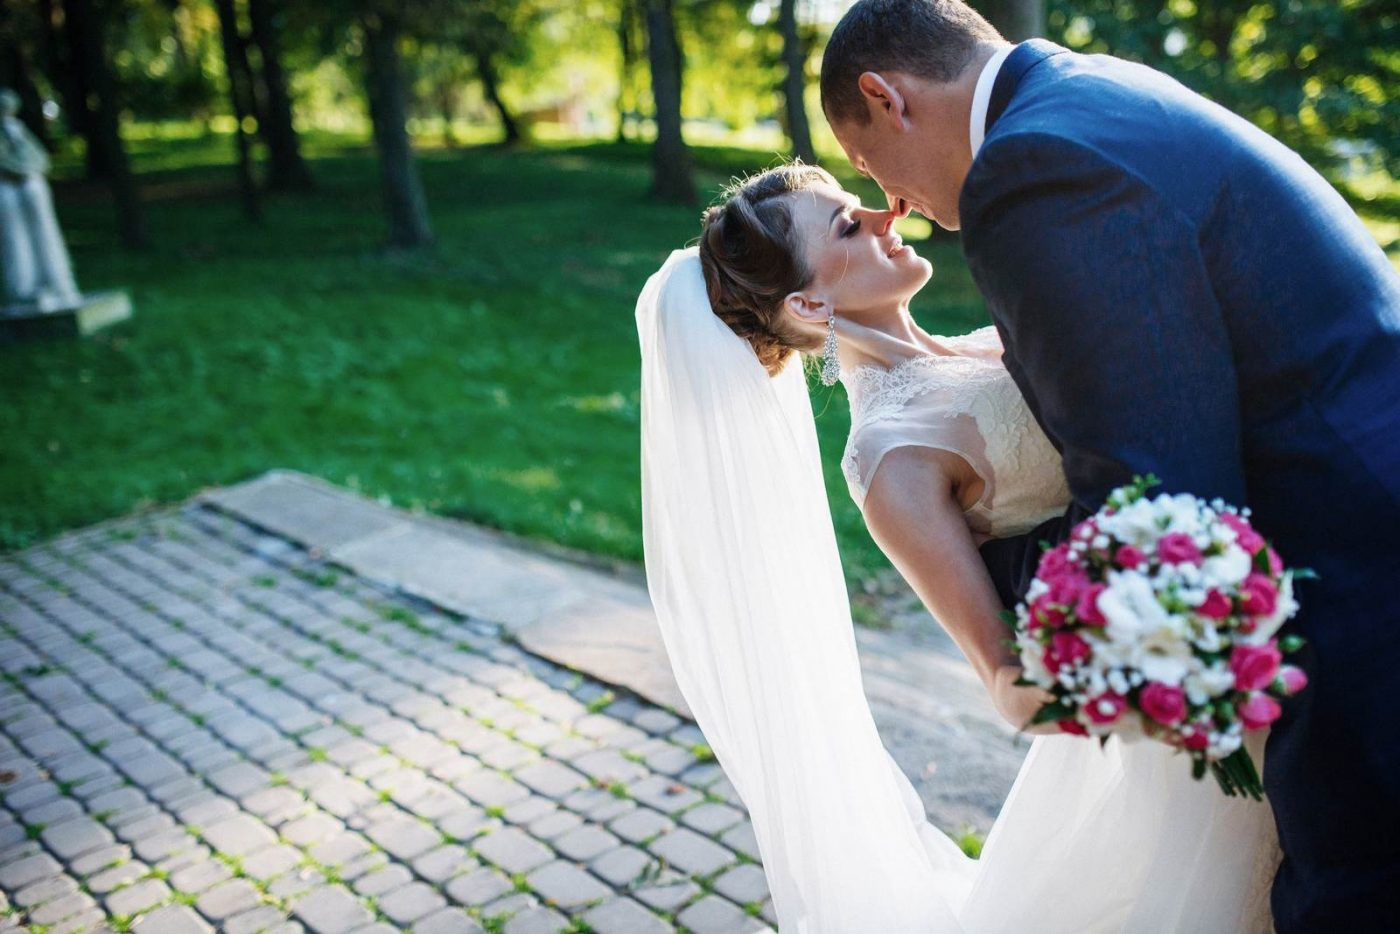 Bend wedding videographers